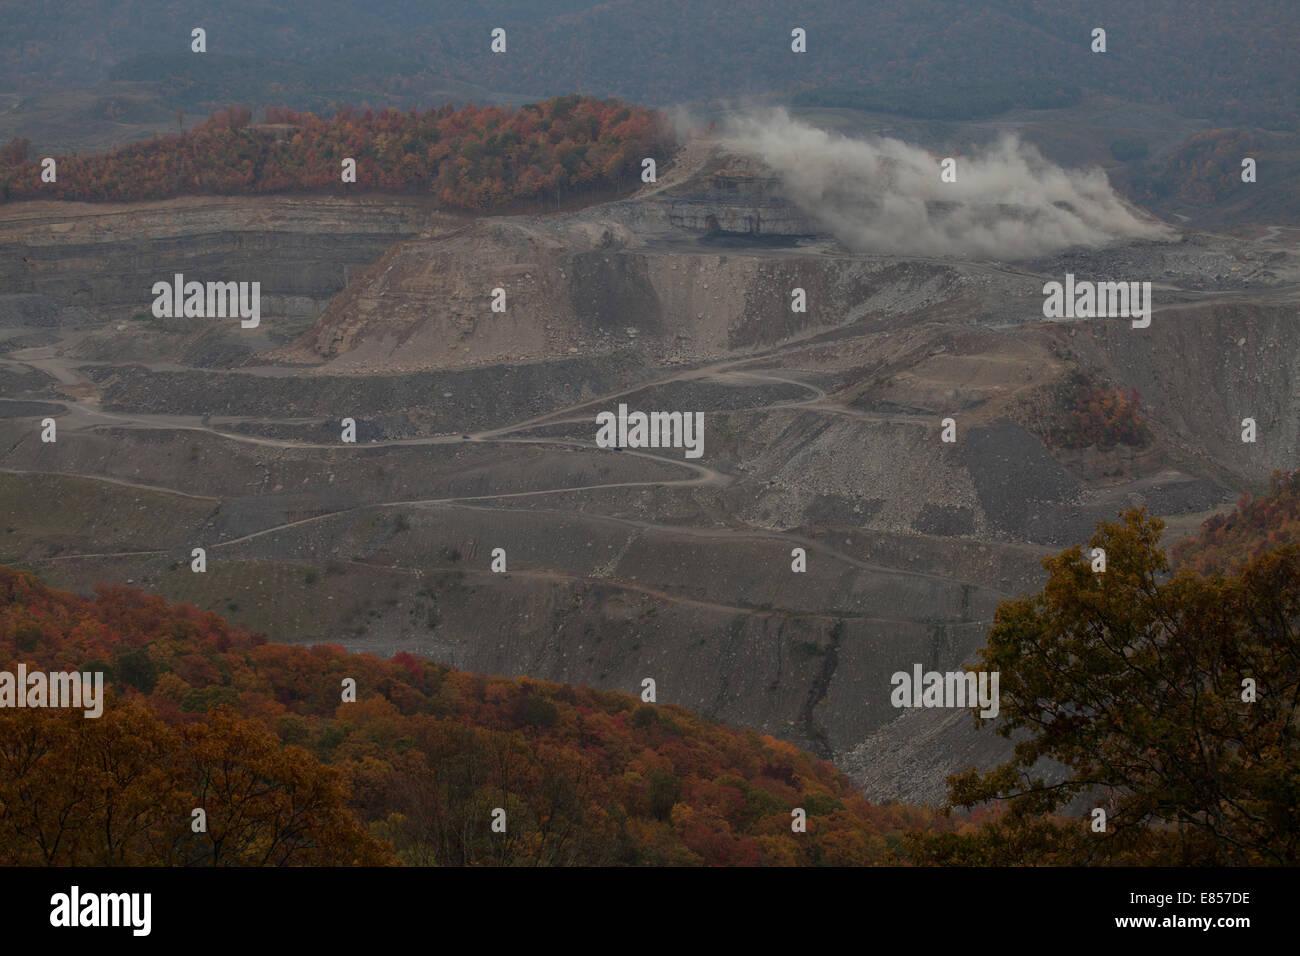 Mountaintop Removal appalachia - Stock Image